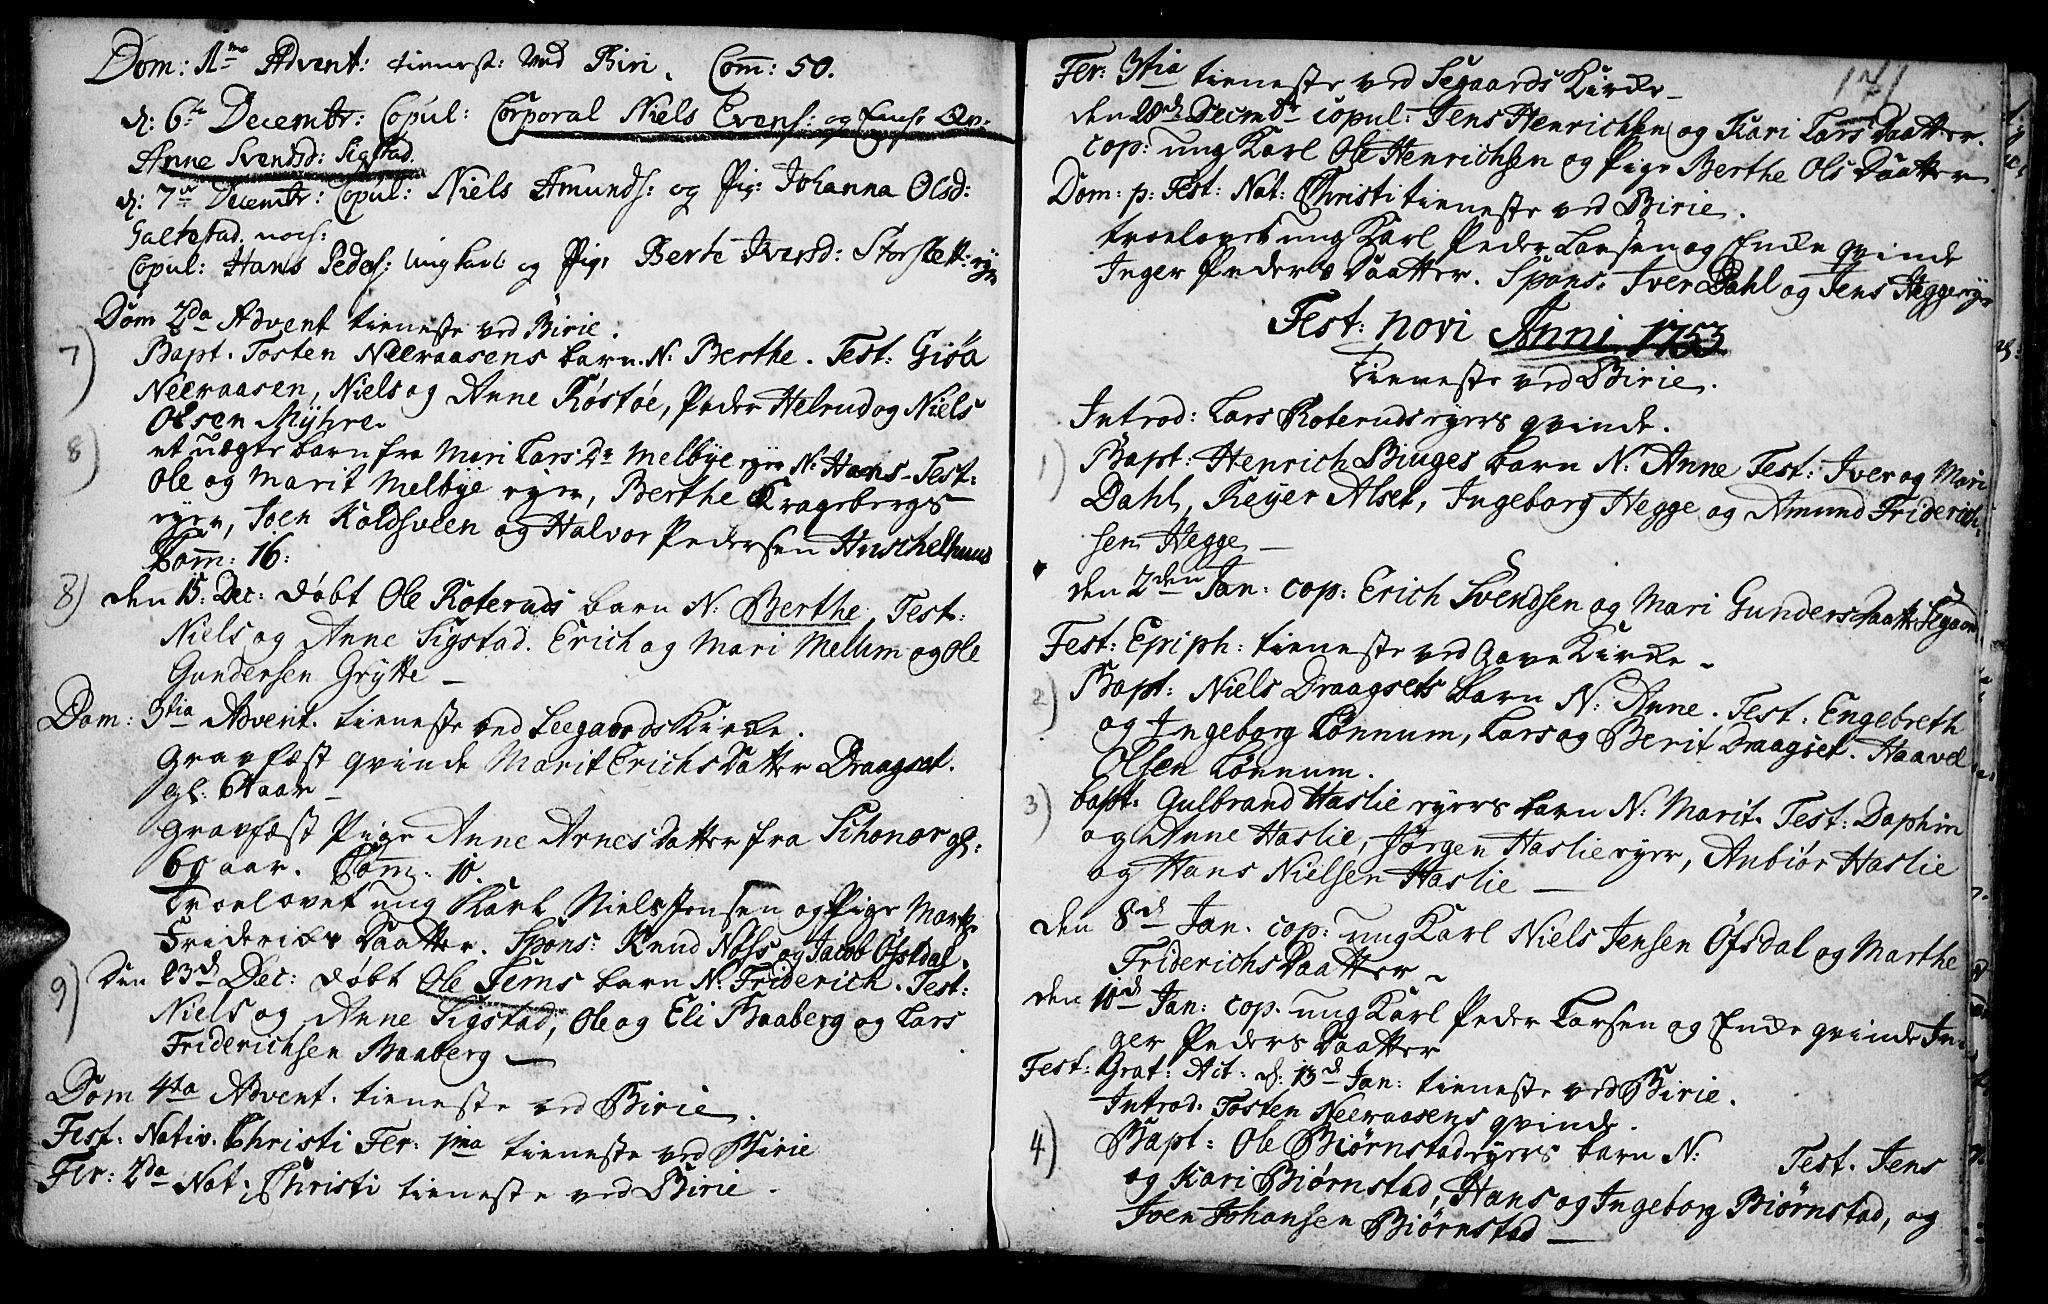 SAH, Biri prestekontor, Ministerialbok nr. 1, 1730-1754, s. 171